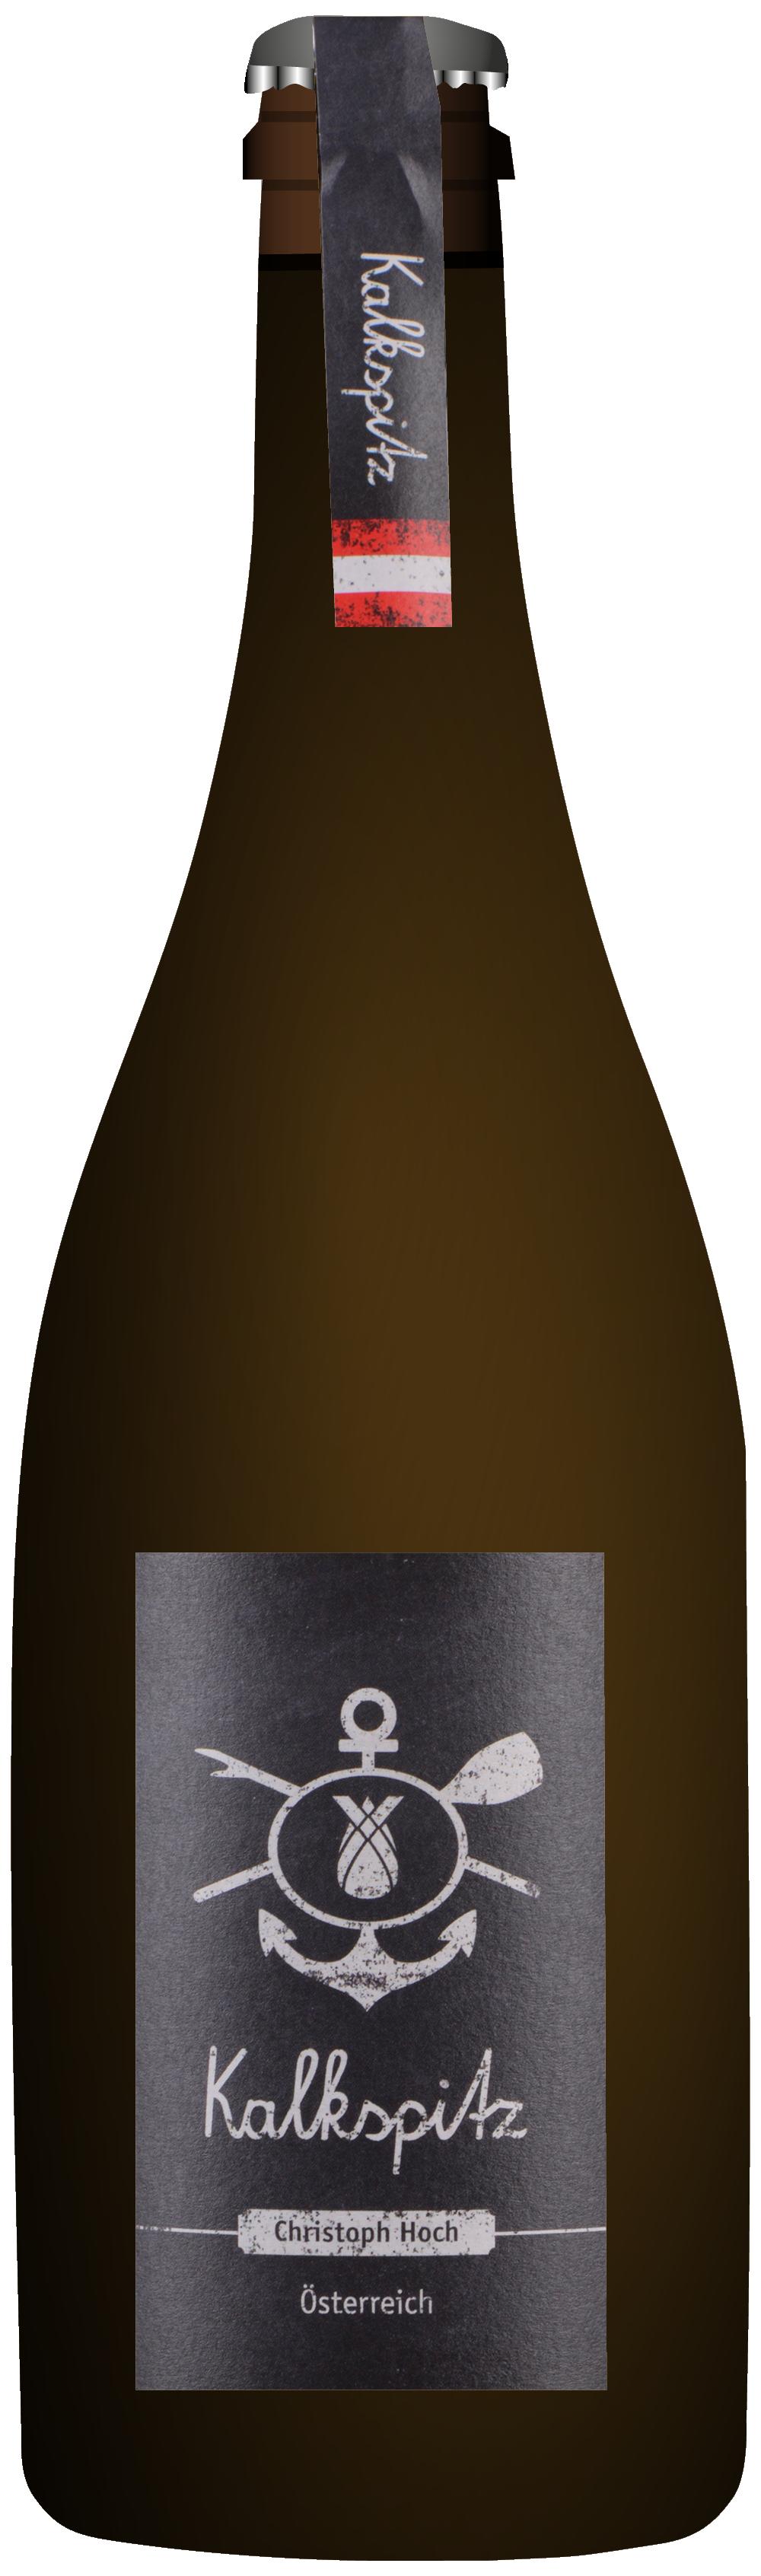 the natural wine company club december 2020 austria christoph hoch kalkspitz 2